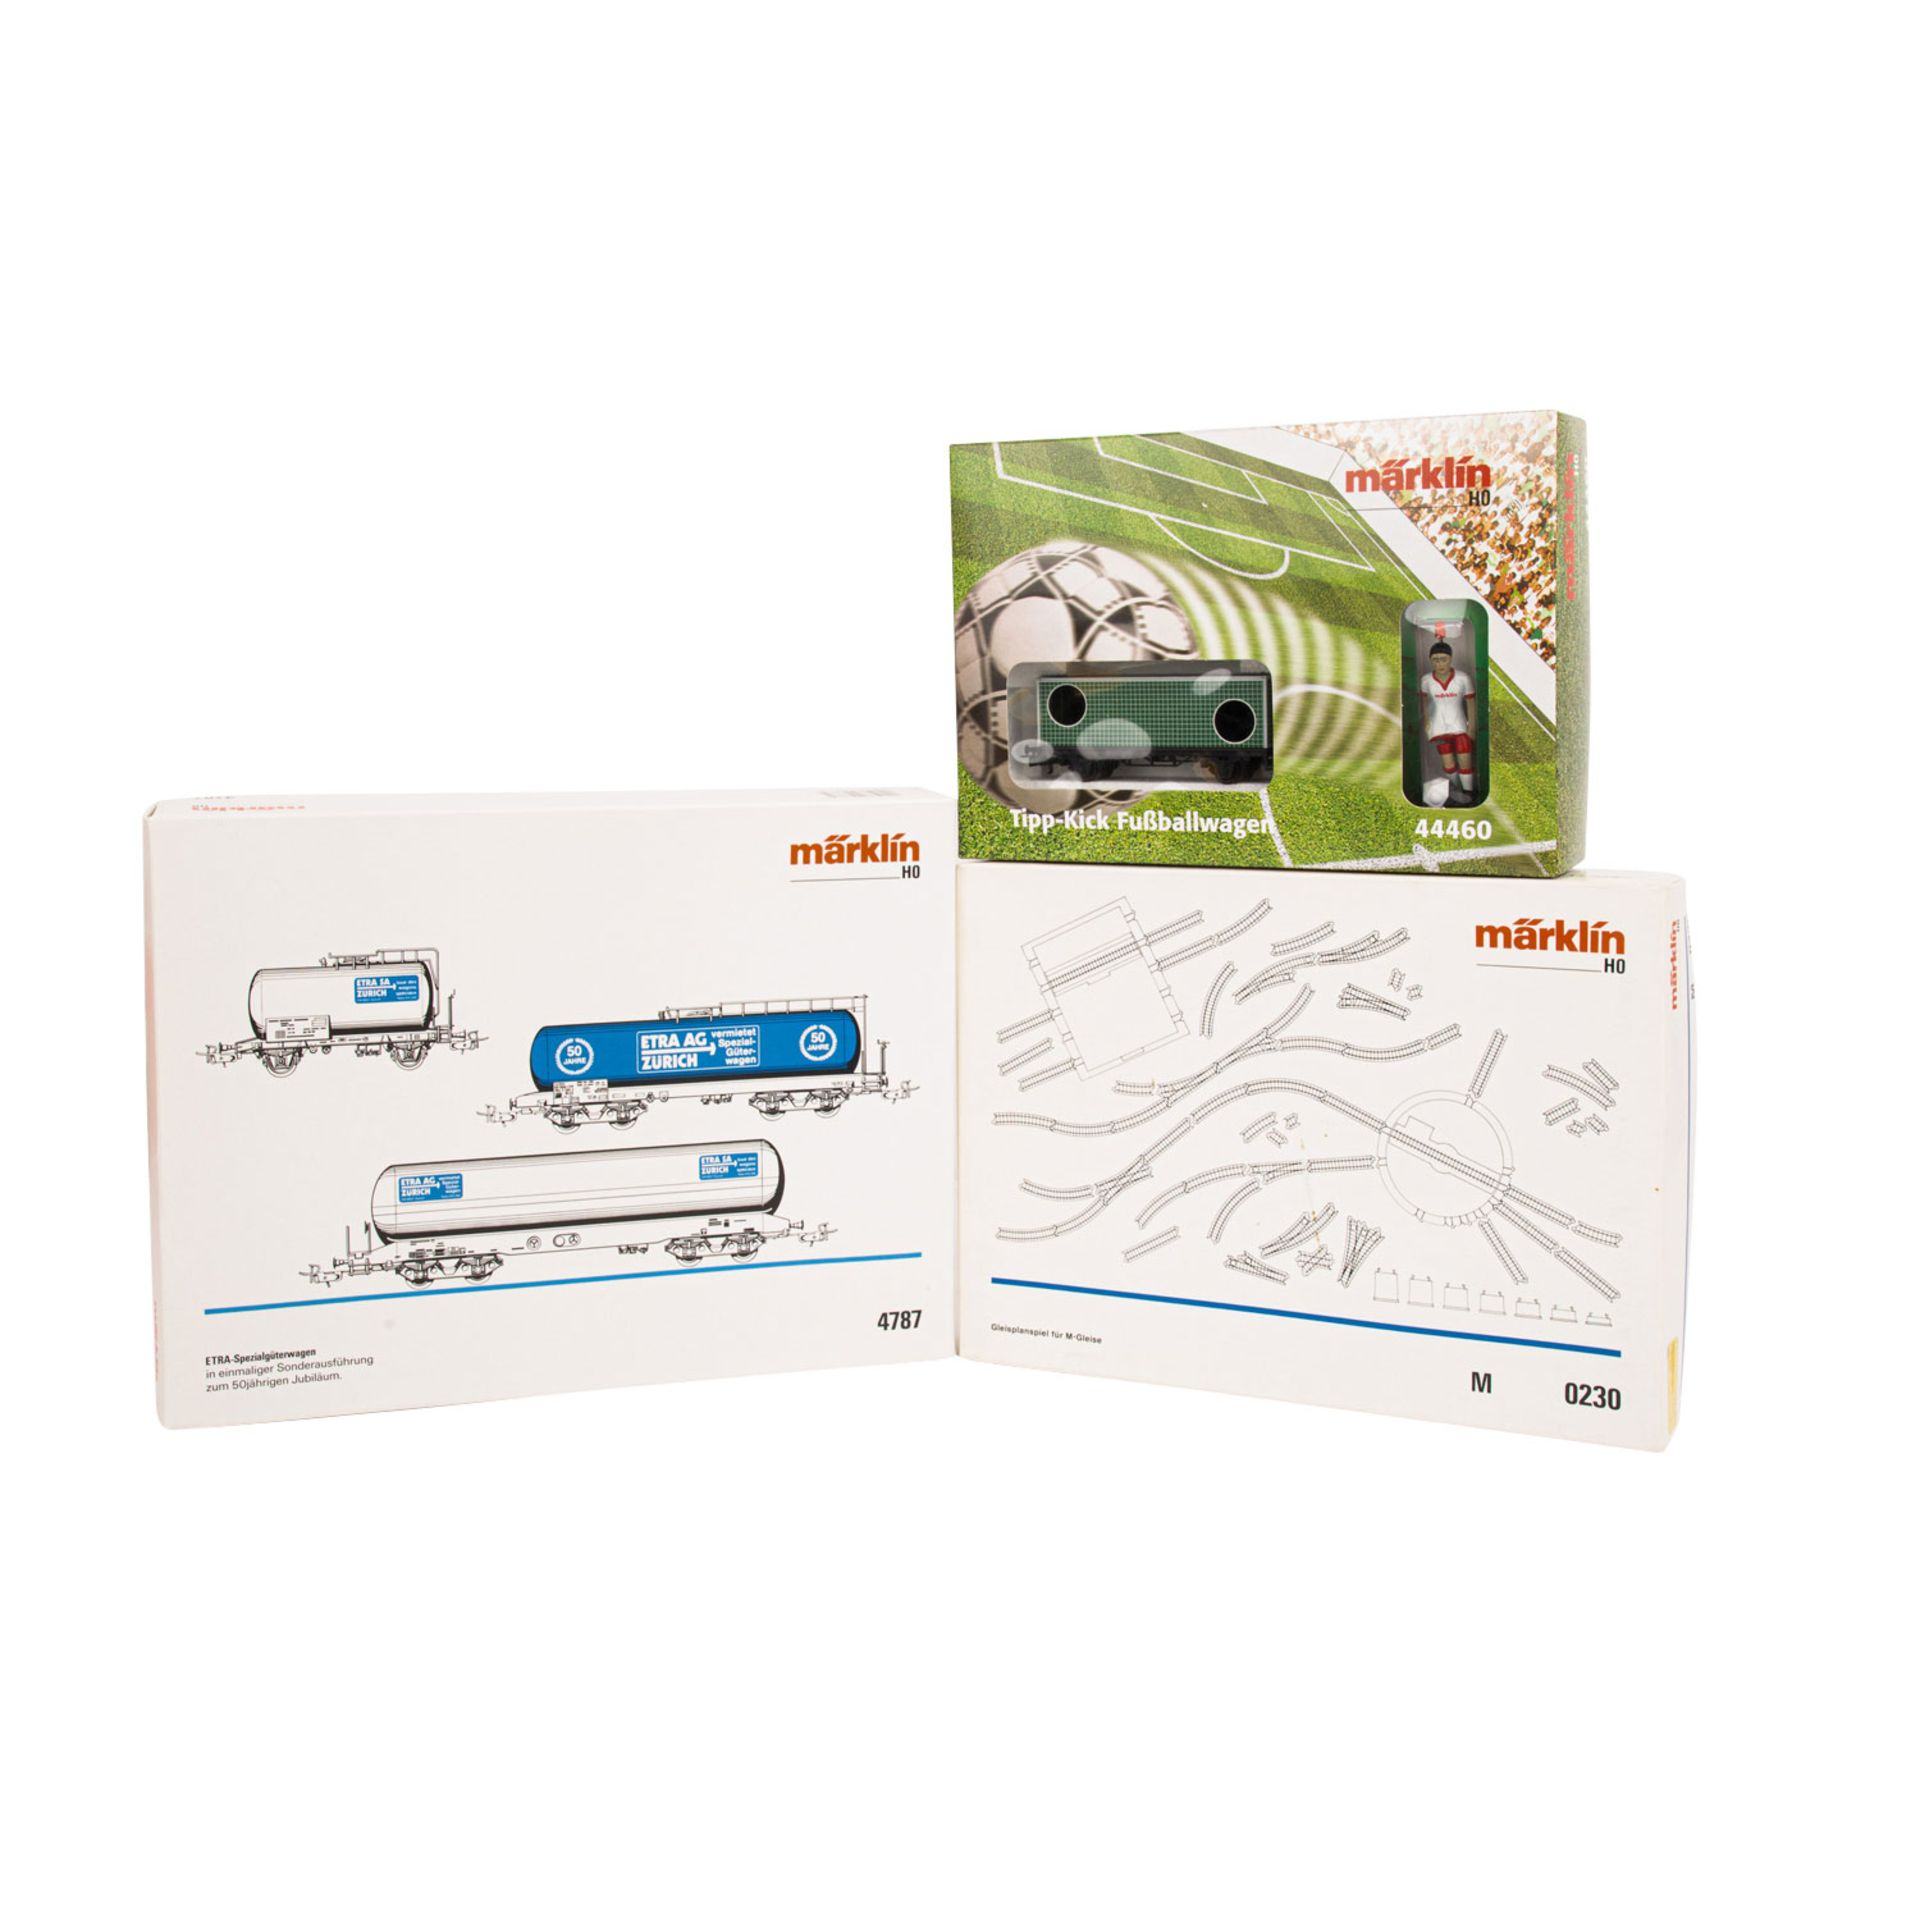 MÄRKLIN 3-tlg Konvolut, Spur H0,bestehend aus Tipp-Kick Fußballwagen 44460, 3-tlg Wa